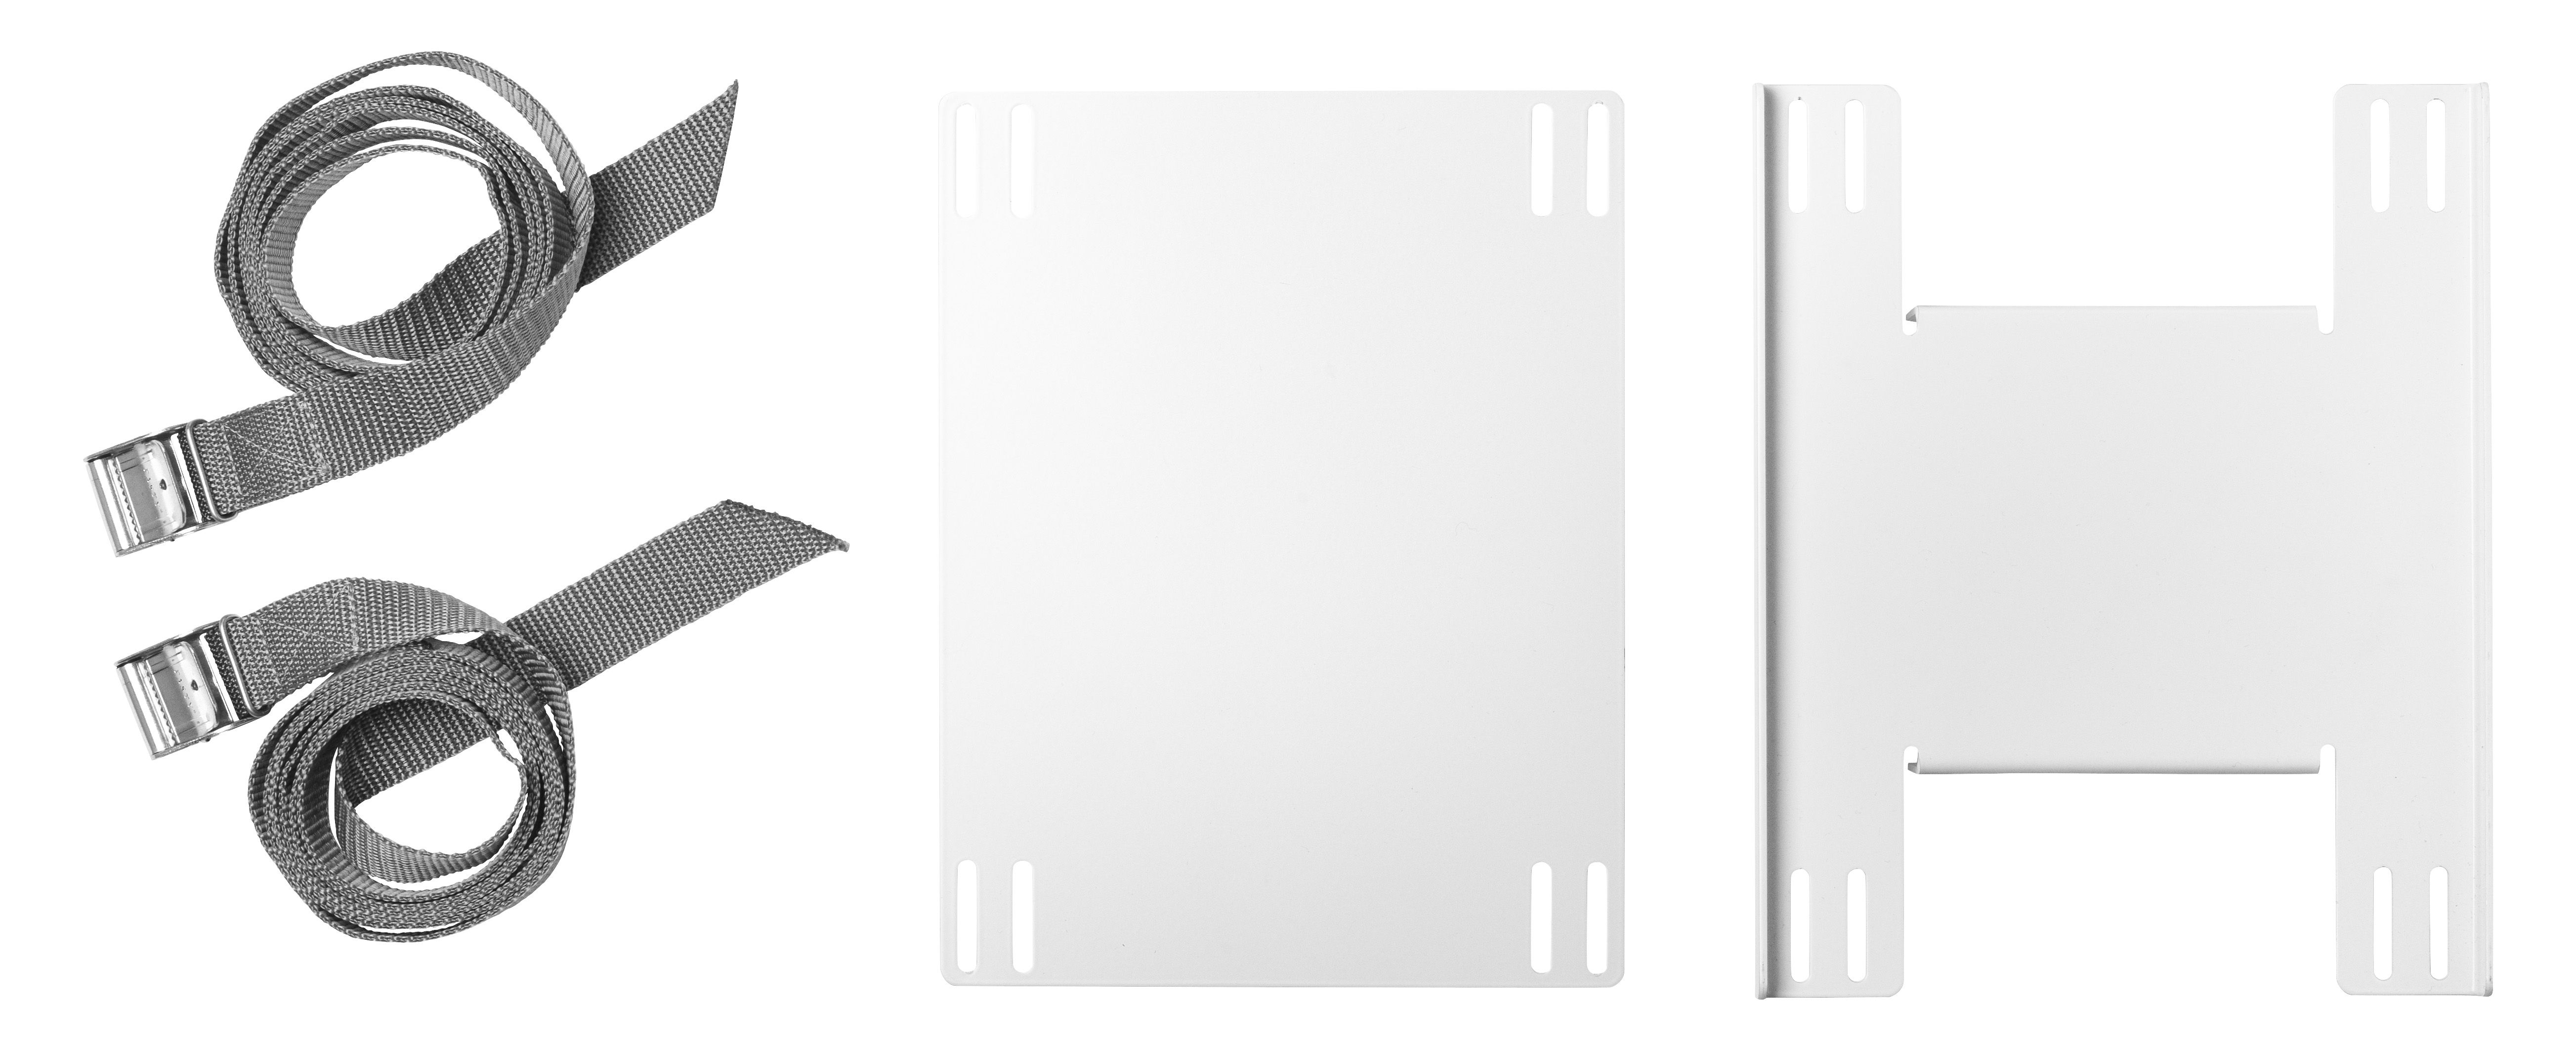 Möbel - Büromöbel - String Works Halter PC-Halterung - String Furniture - Weiß - lackierter Stahl